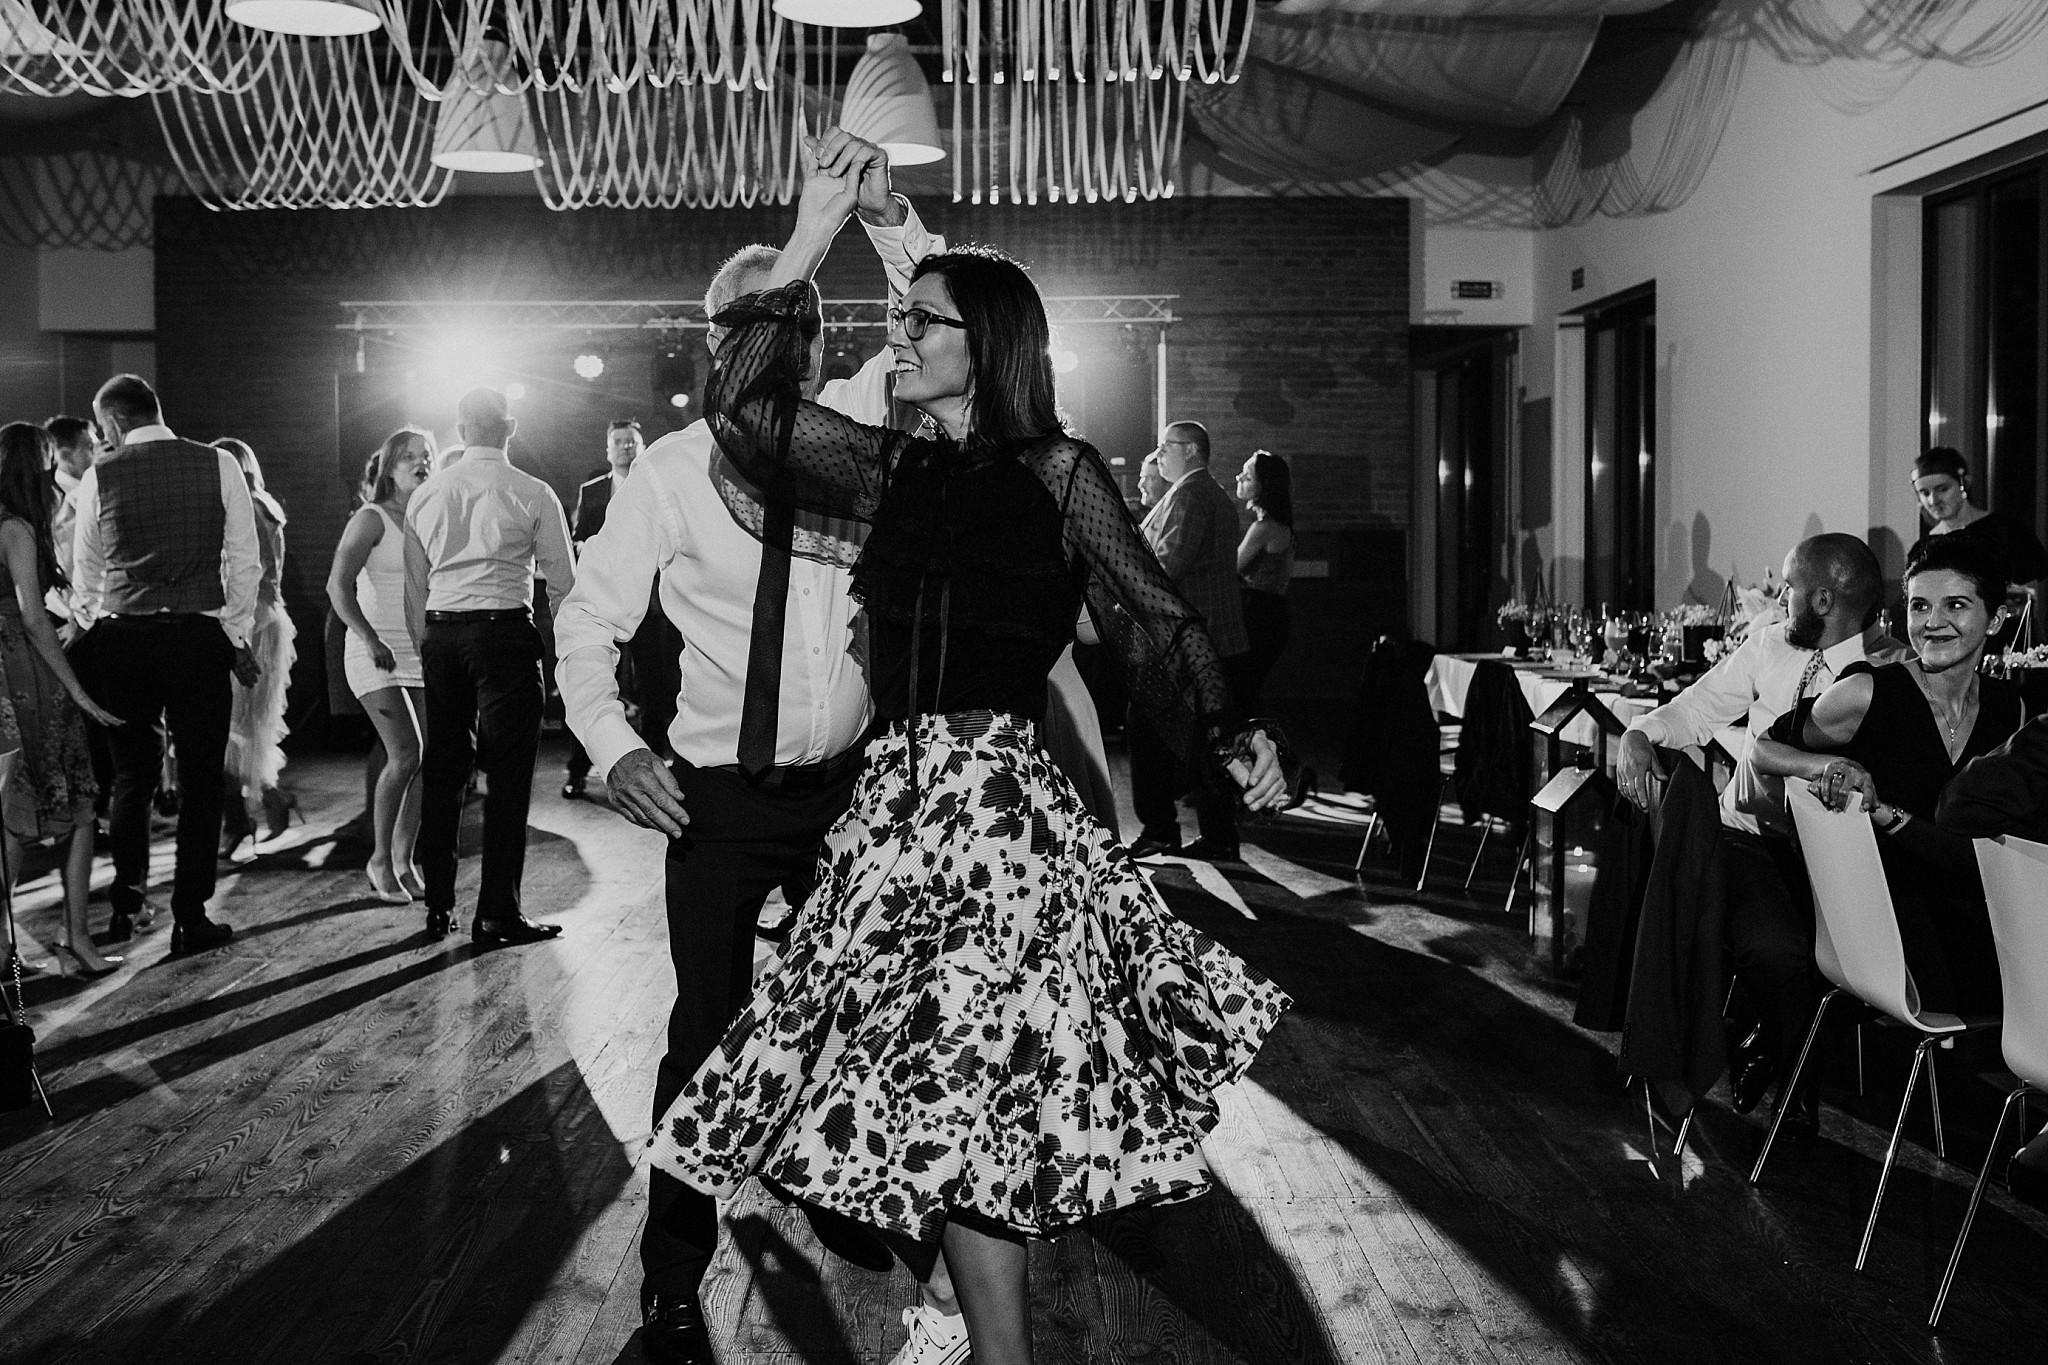 fotograf poznan wesele dobra truskawka piekne wesele pod poznaniem wesele w dobrej truskawce piekna para mloda slub marzen slub koronawirus slub listopad wesele koronawirus 425